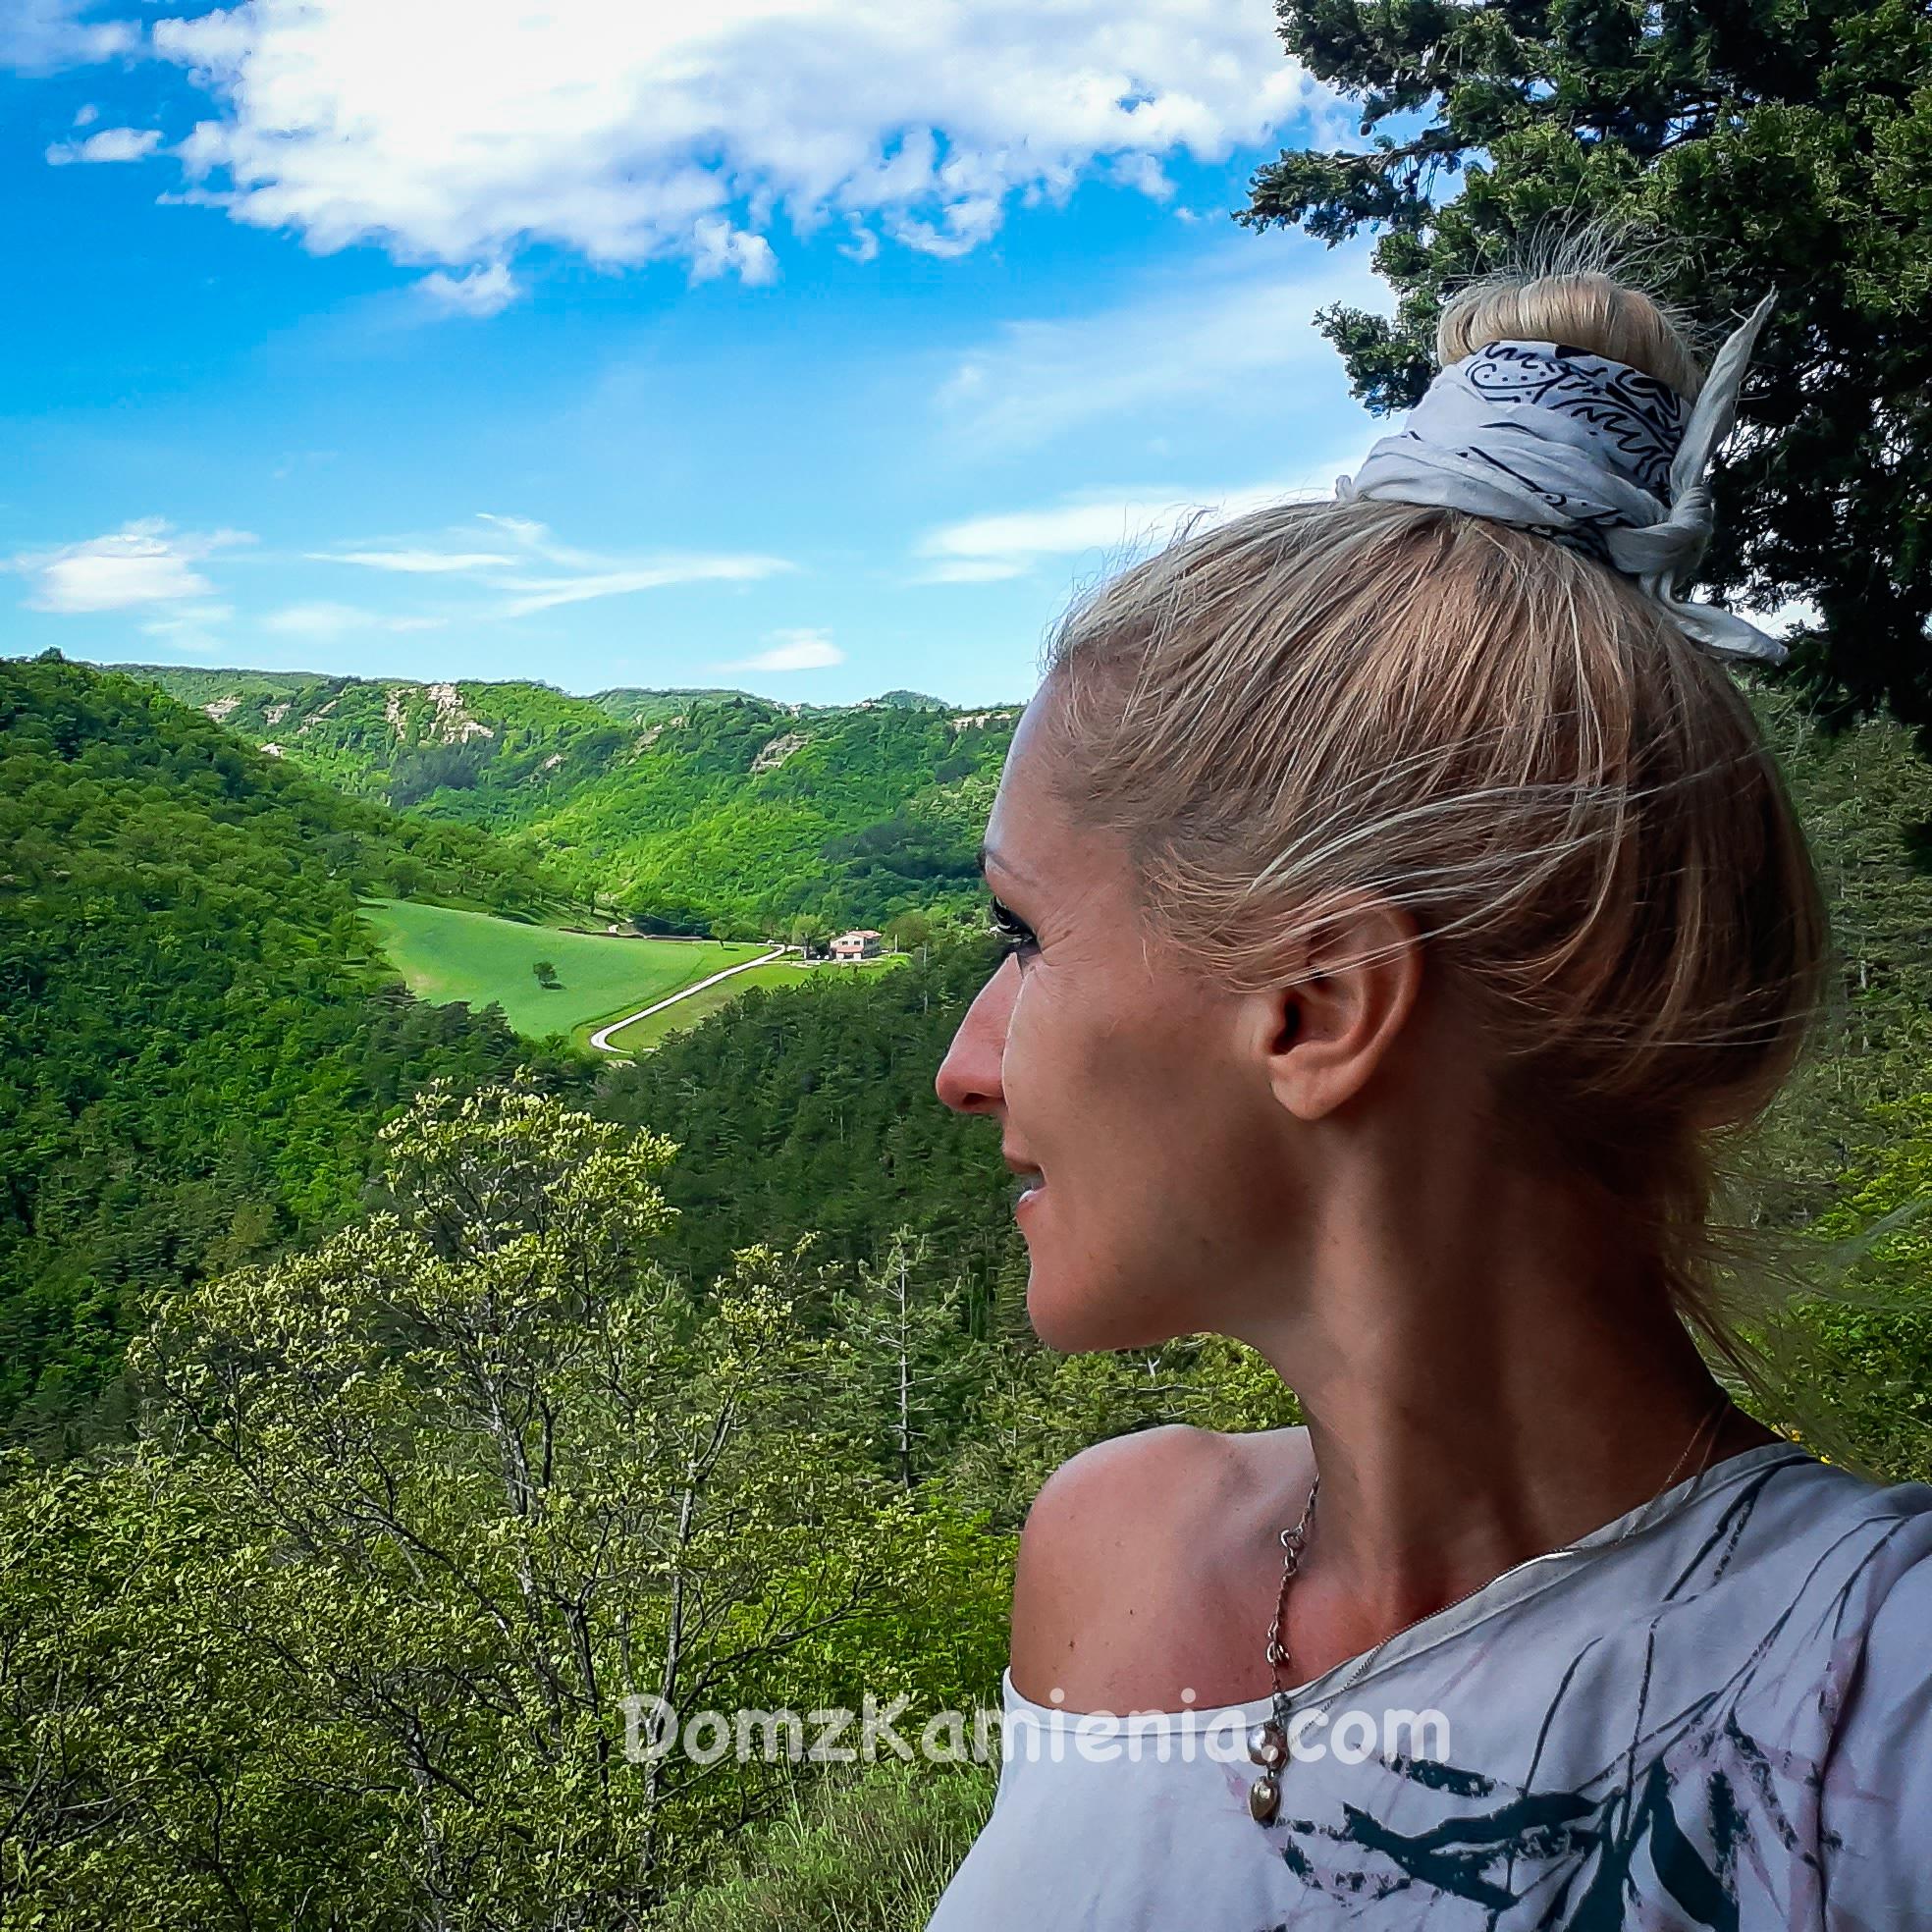 Trekking z Domem z Kamienia, szlak Dantego Marradi